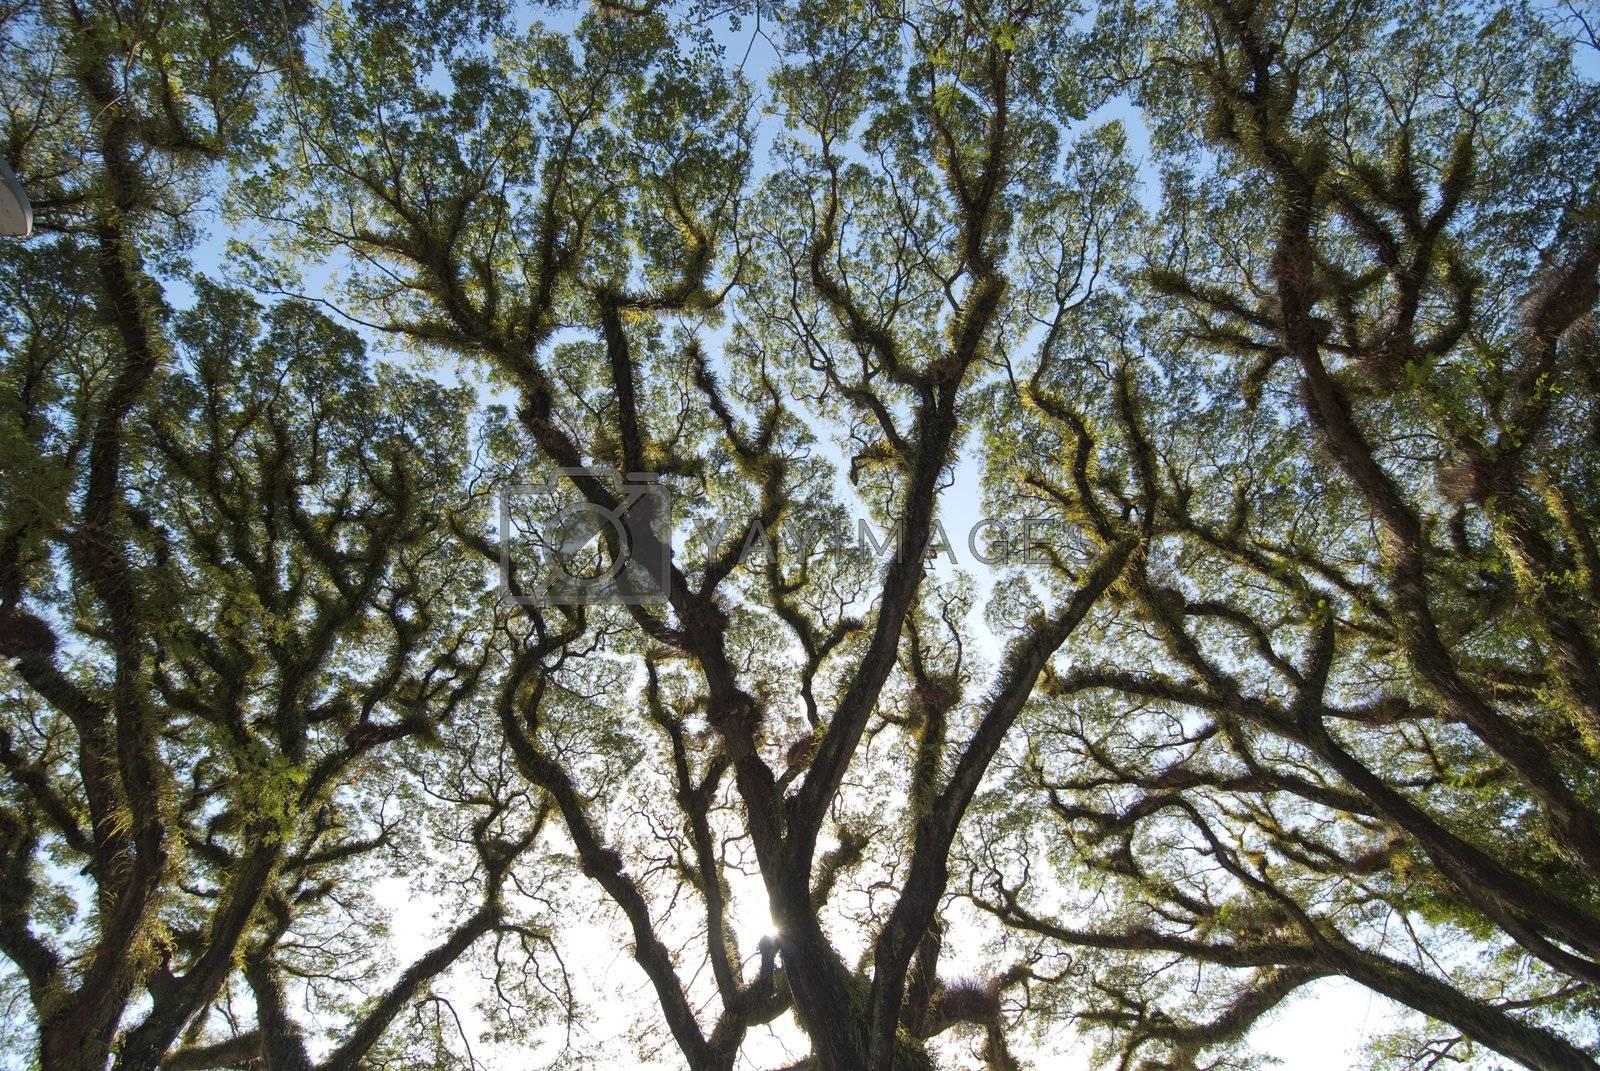 Detail of Daintree National Park, Queensland, Australia by jovannig